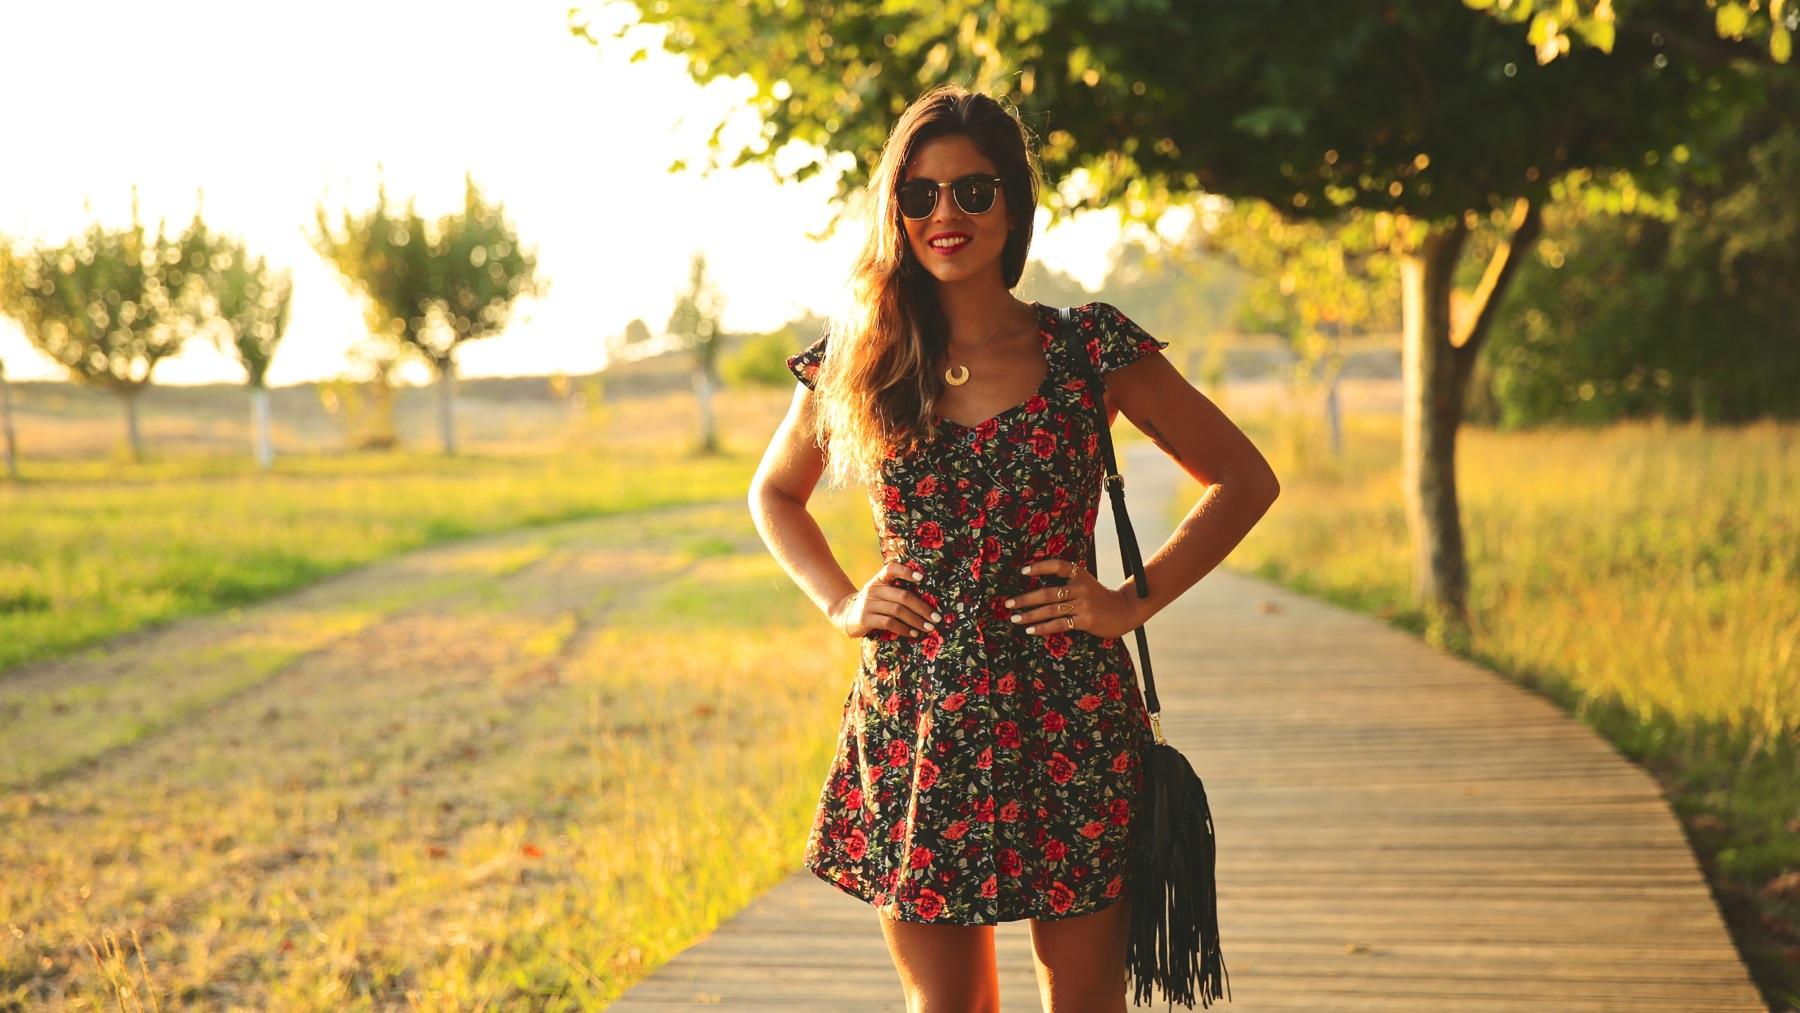 trendy_taste-look-outfit-street_style-ootd-blog-blogger-fashion_spain-moda_españa-flower_print-dress-vestido-flores-sandalias_negras-black_sandals-platforms-sunset-playa-beach-summer-6